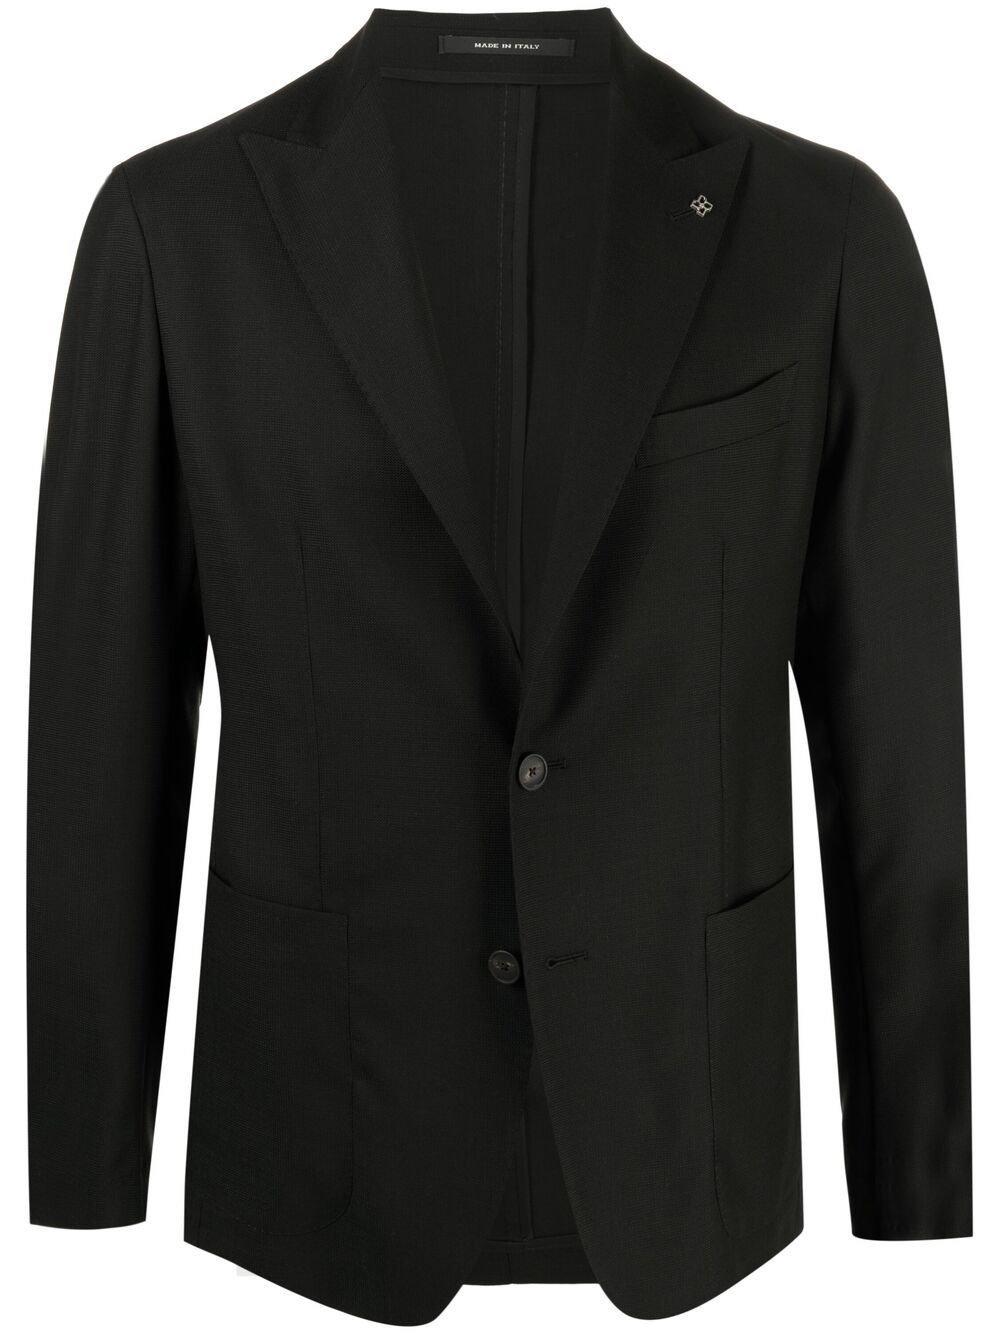 Black Single Breasted Wool Jacket